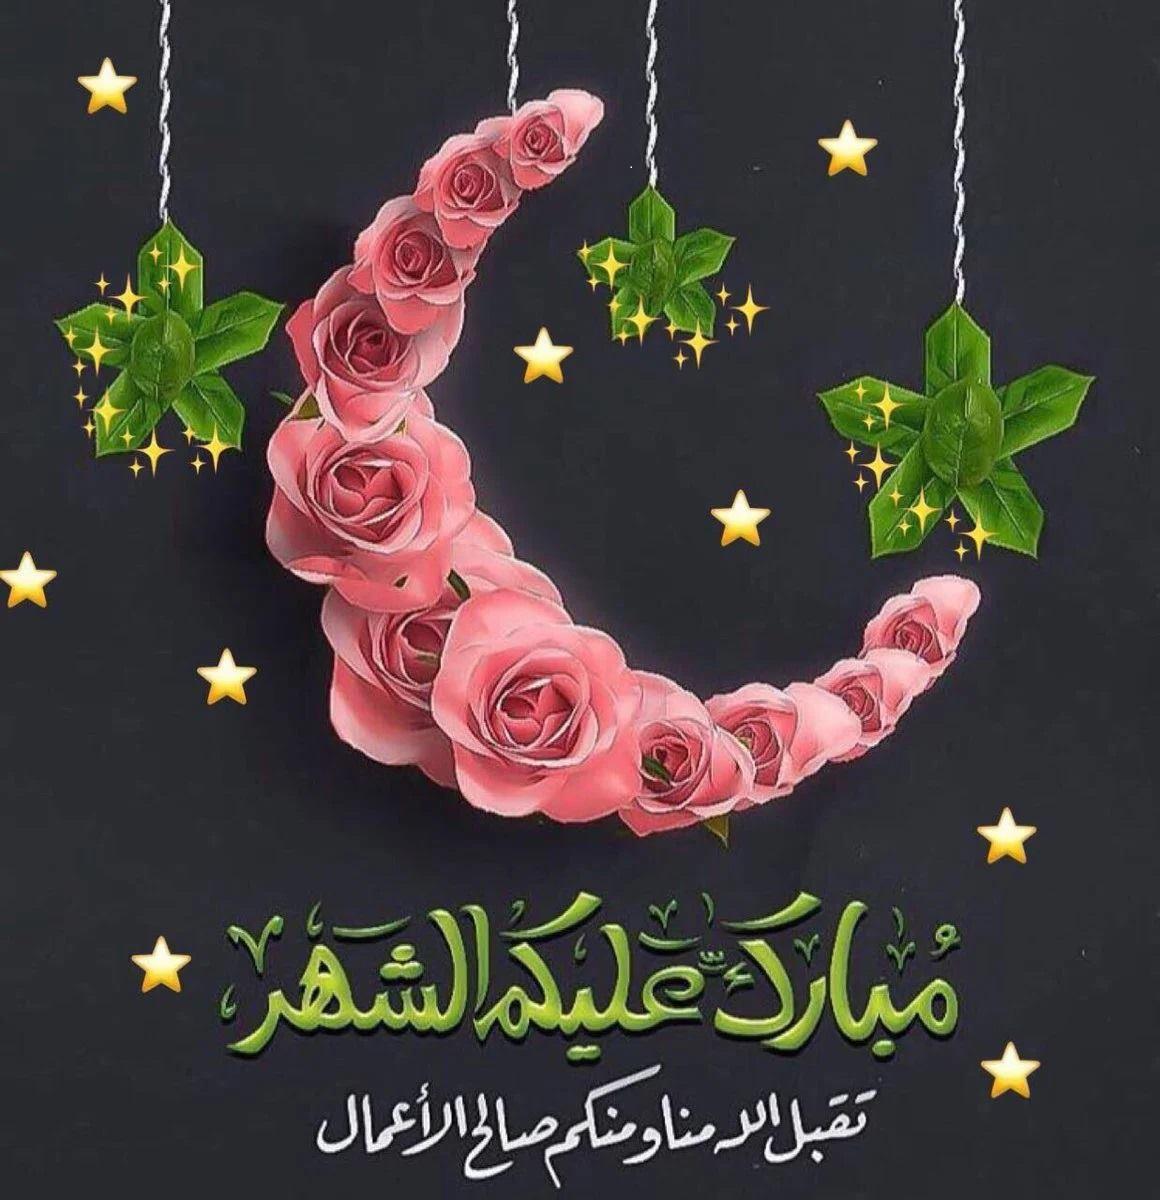 رمضان9.jpg